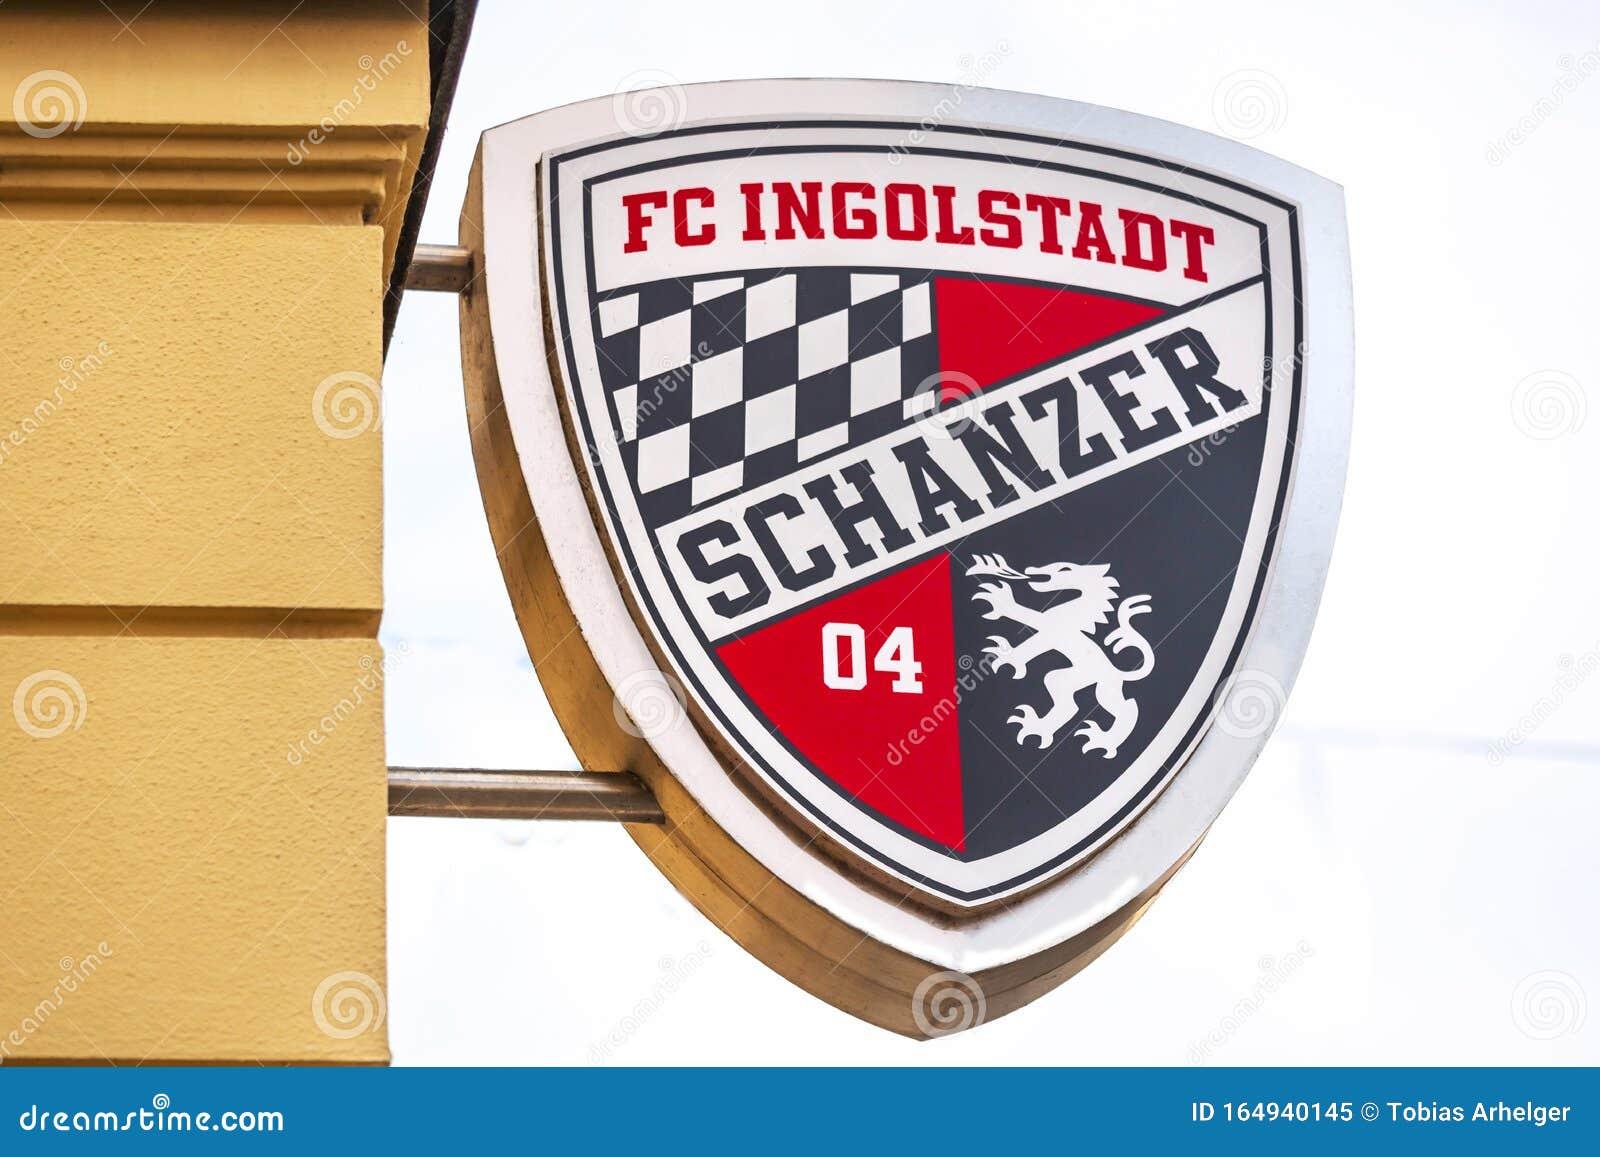 Fc Ingolstadt Soccer Sign In Ingolstadt Germany Editorial Image Image Of November Black 164940145